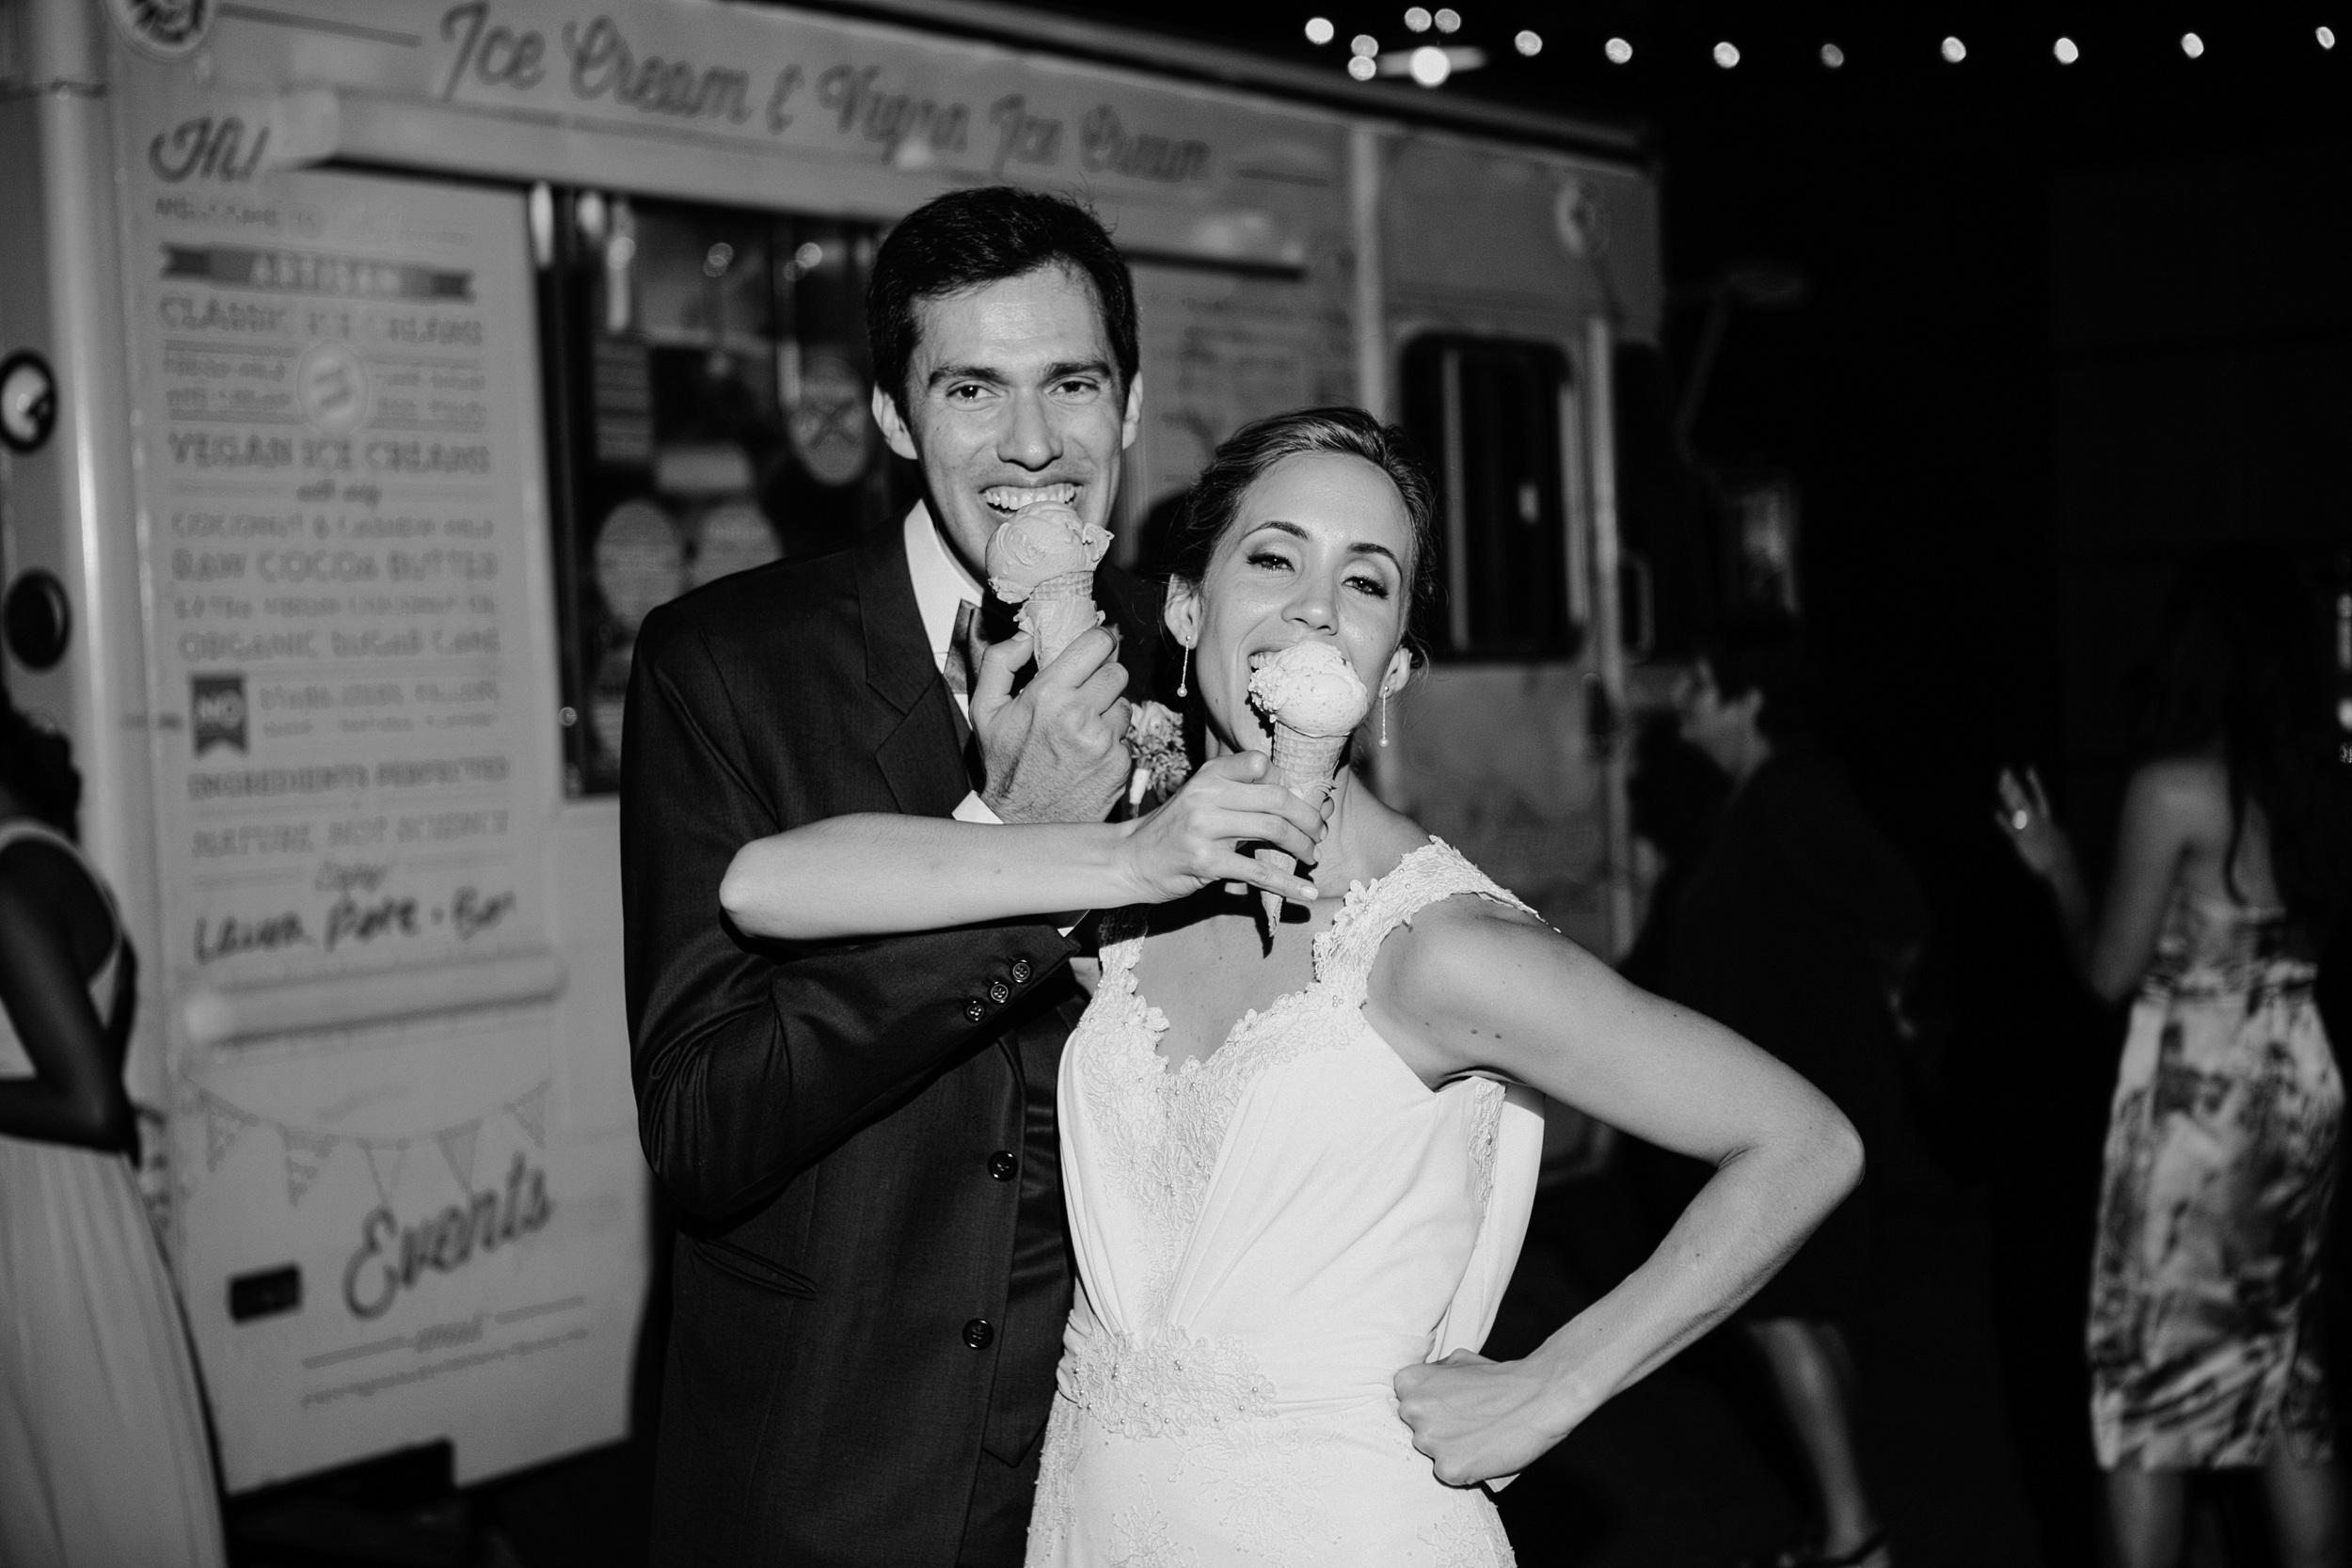 martha stewart weddings - 11 Wedding Cake Swaps Guests Will Love